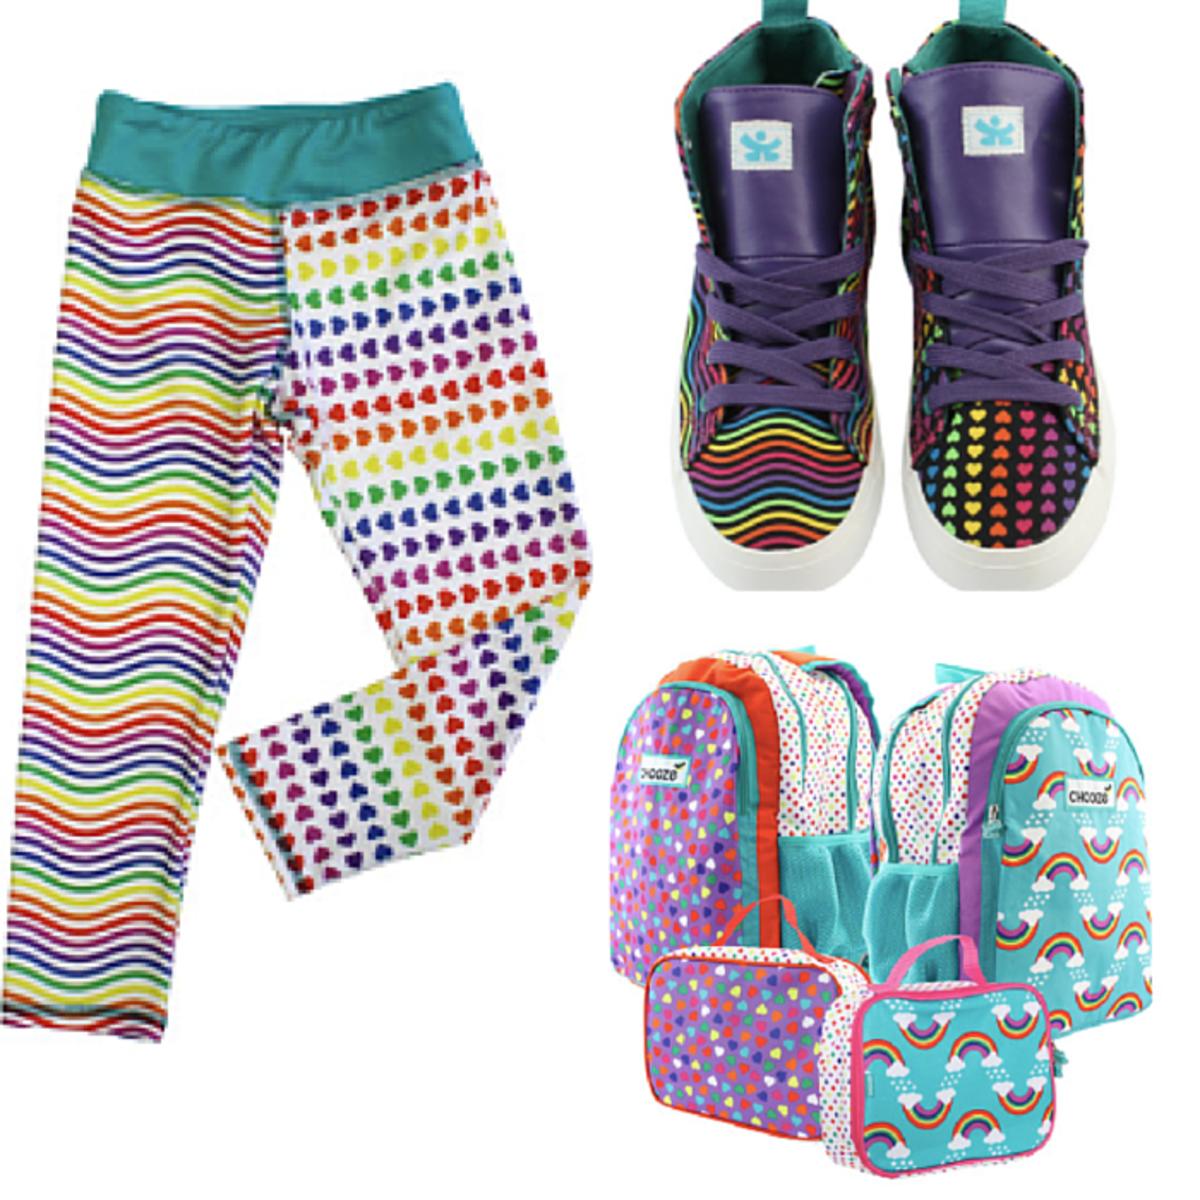 unique clothing, apparel, accessories, footwear